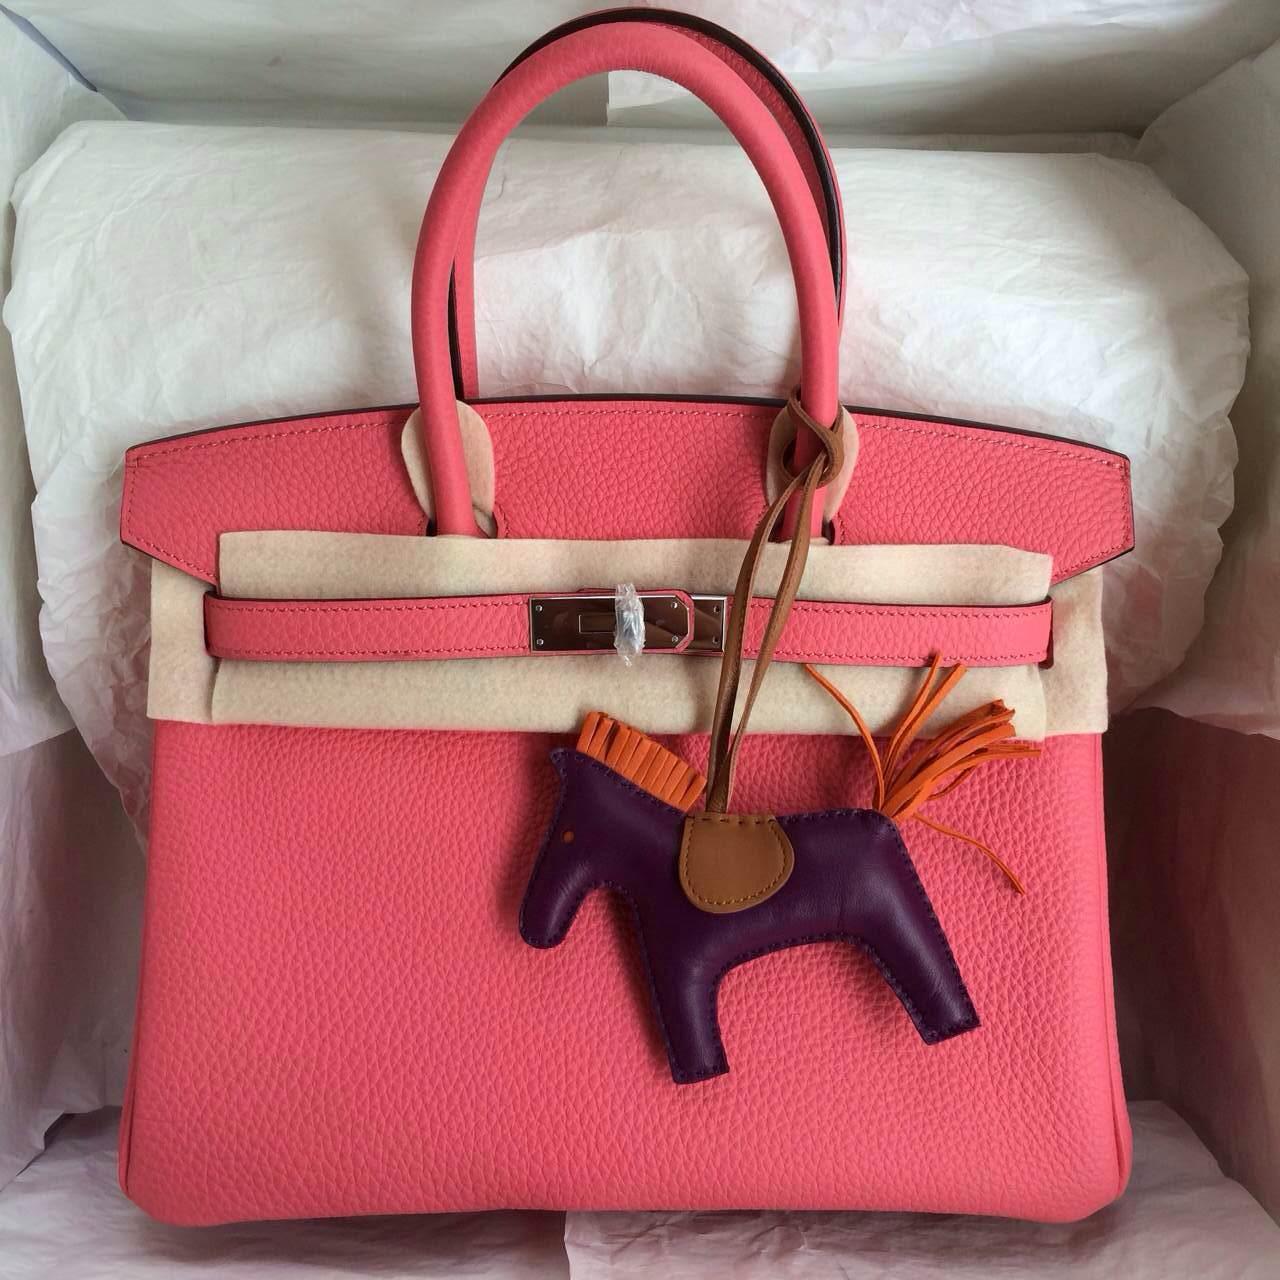 Hermes Birkin30 France Togo Leather U5 Rose Lipstick Color Hand Stitching